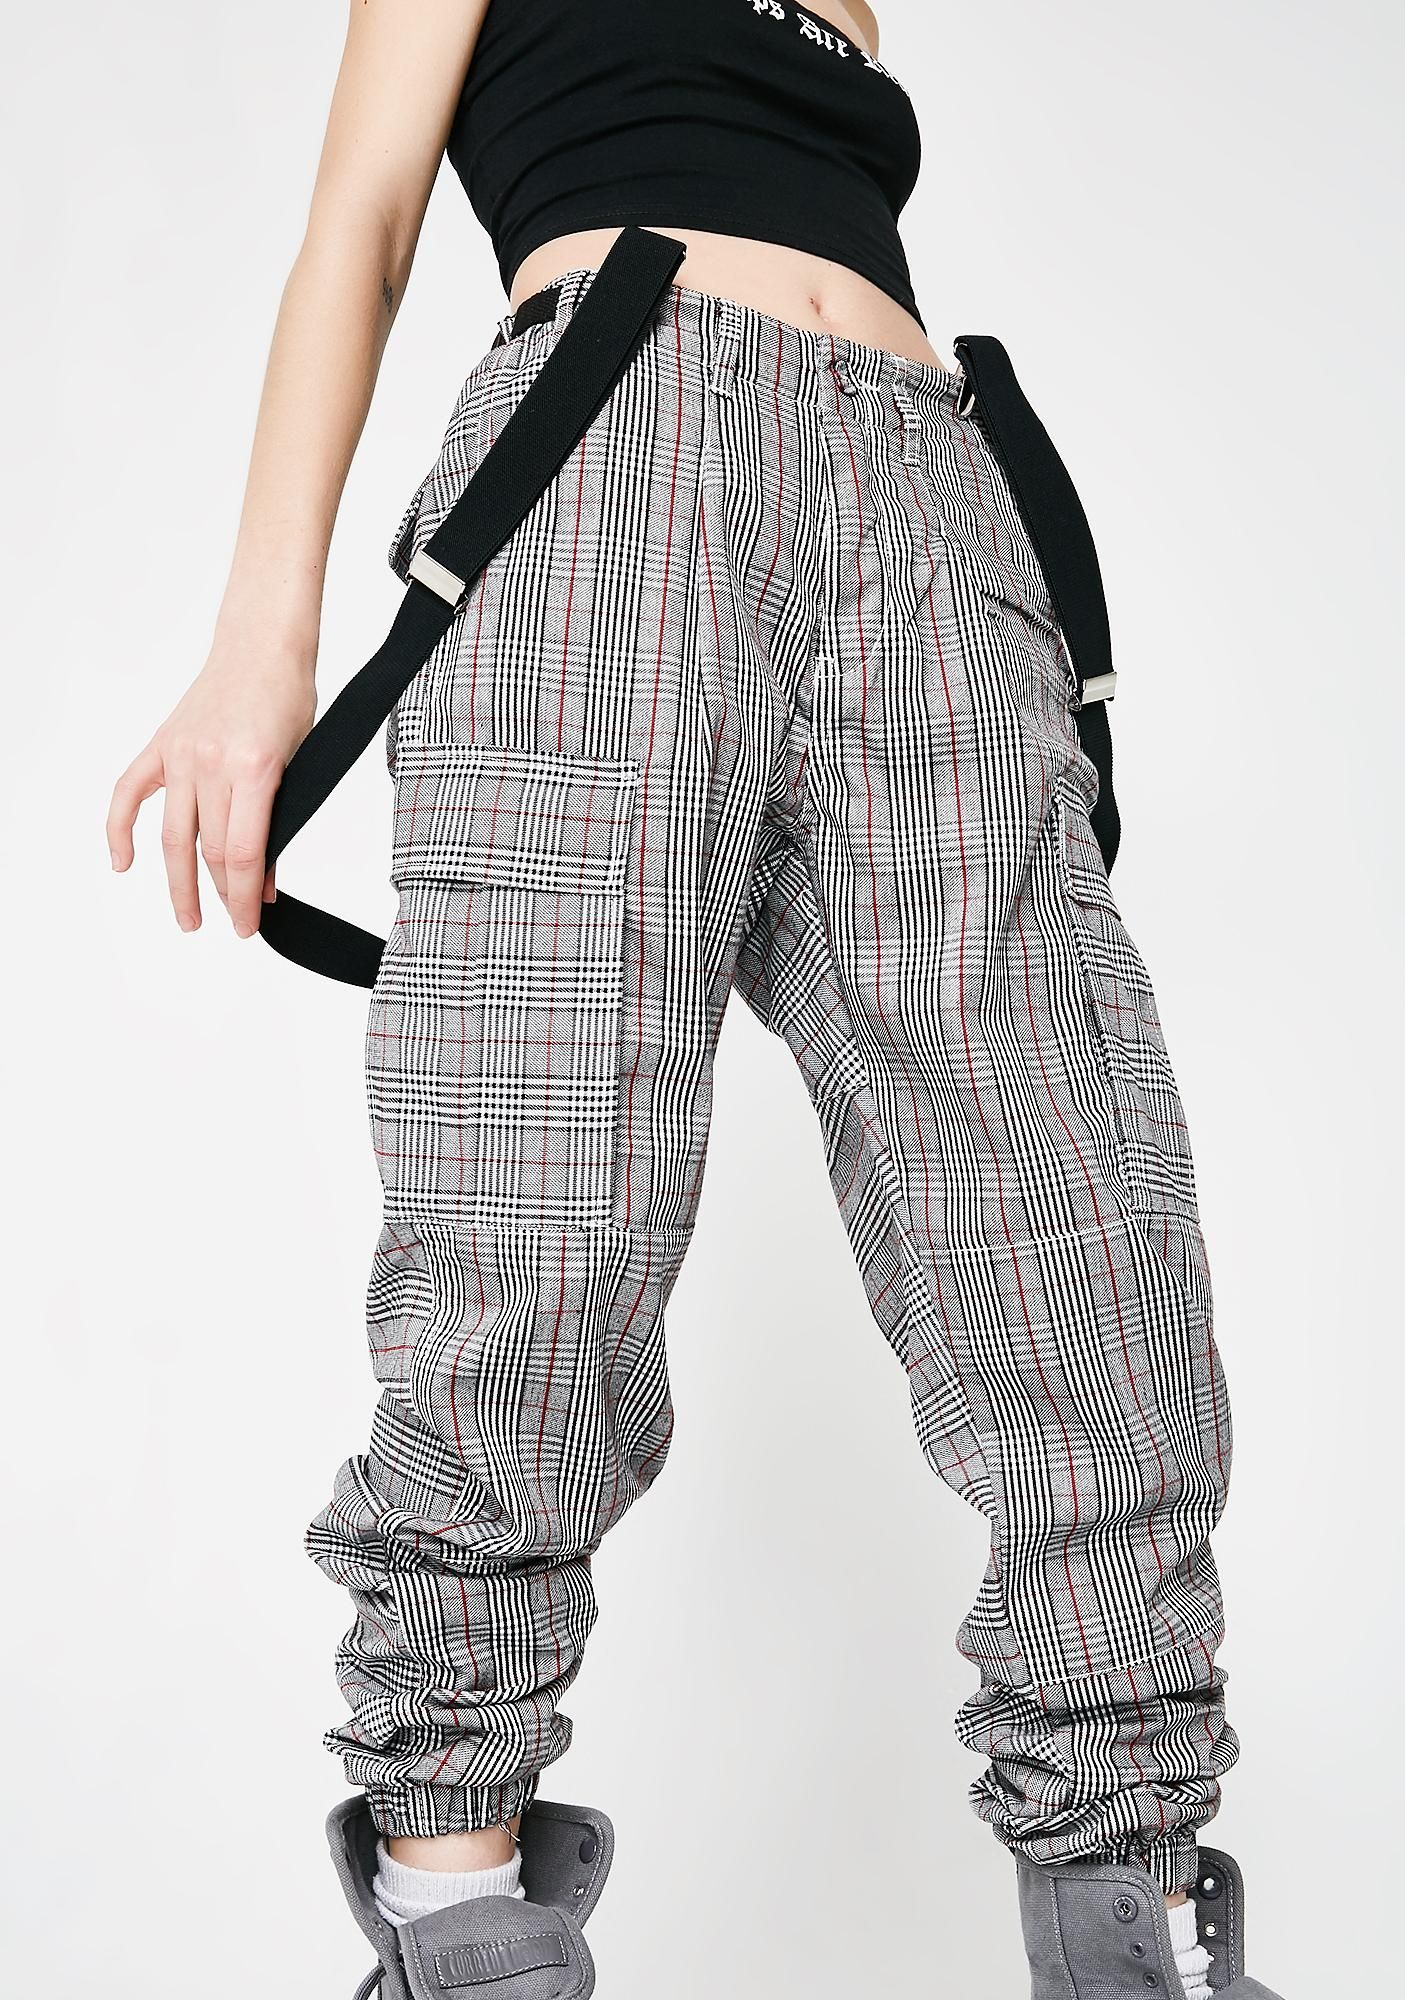 dd30f05f9fb Poster Grl Do Homewerk Suspender Cargo Pants